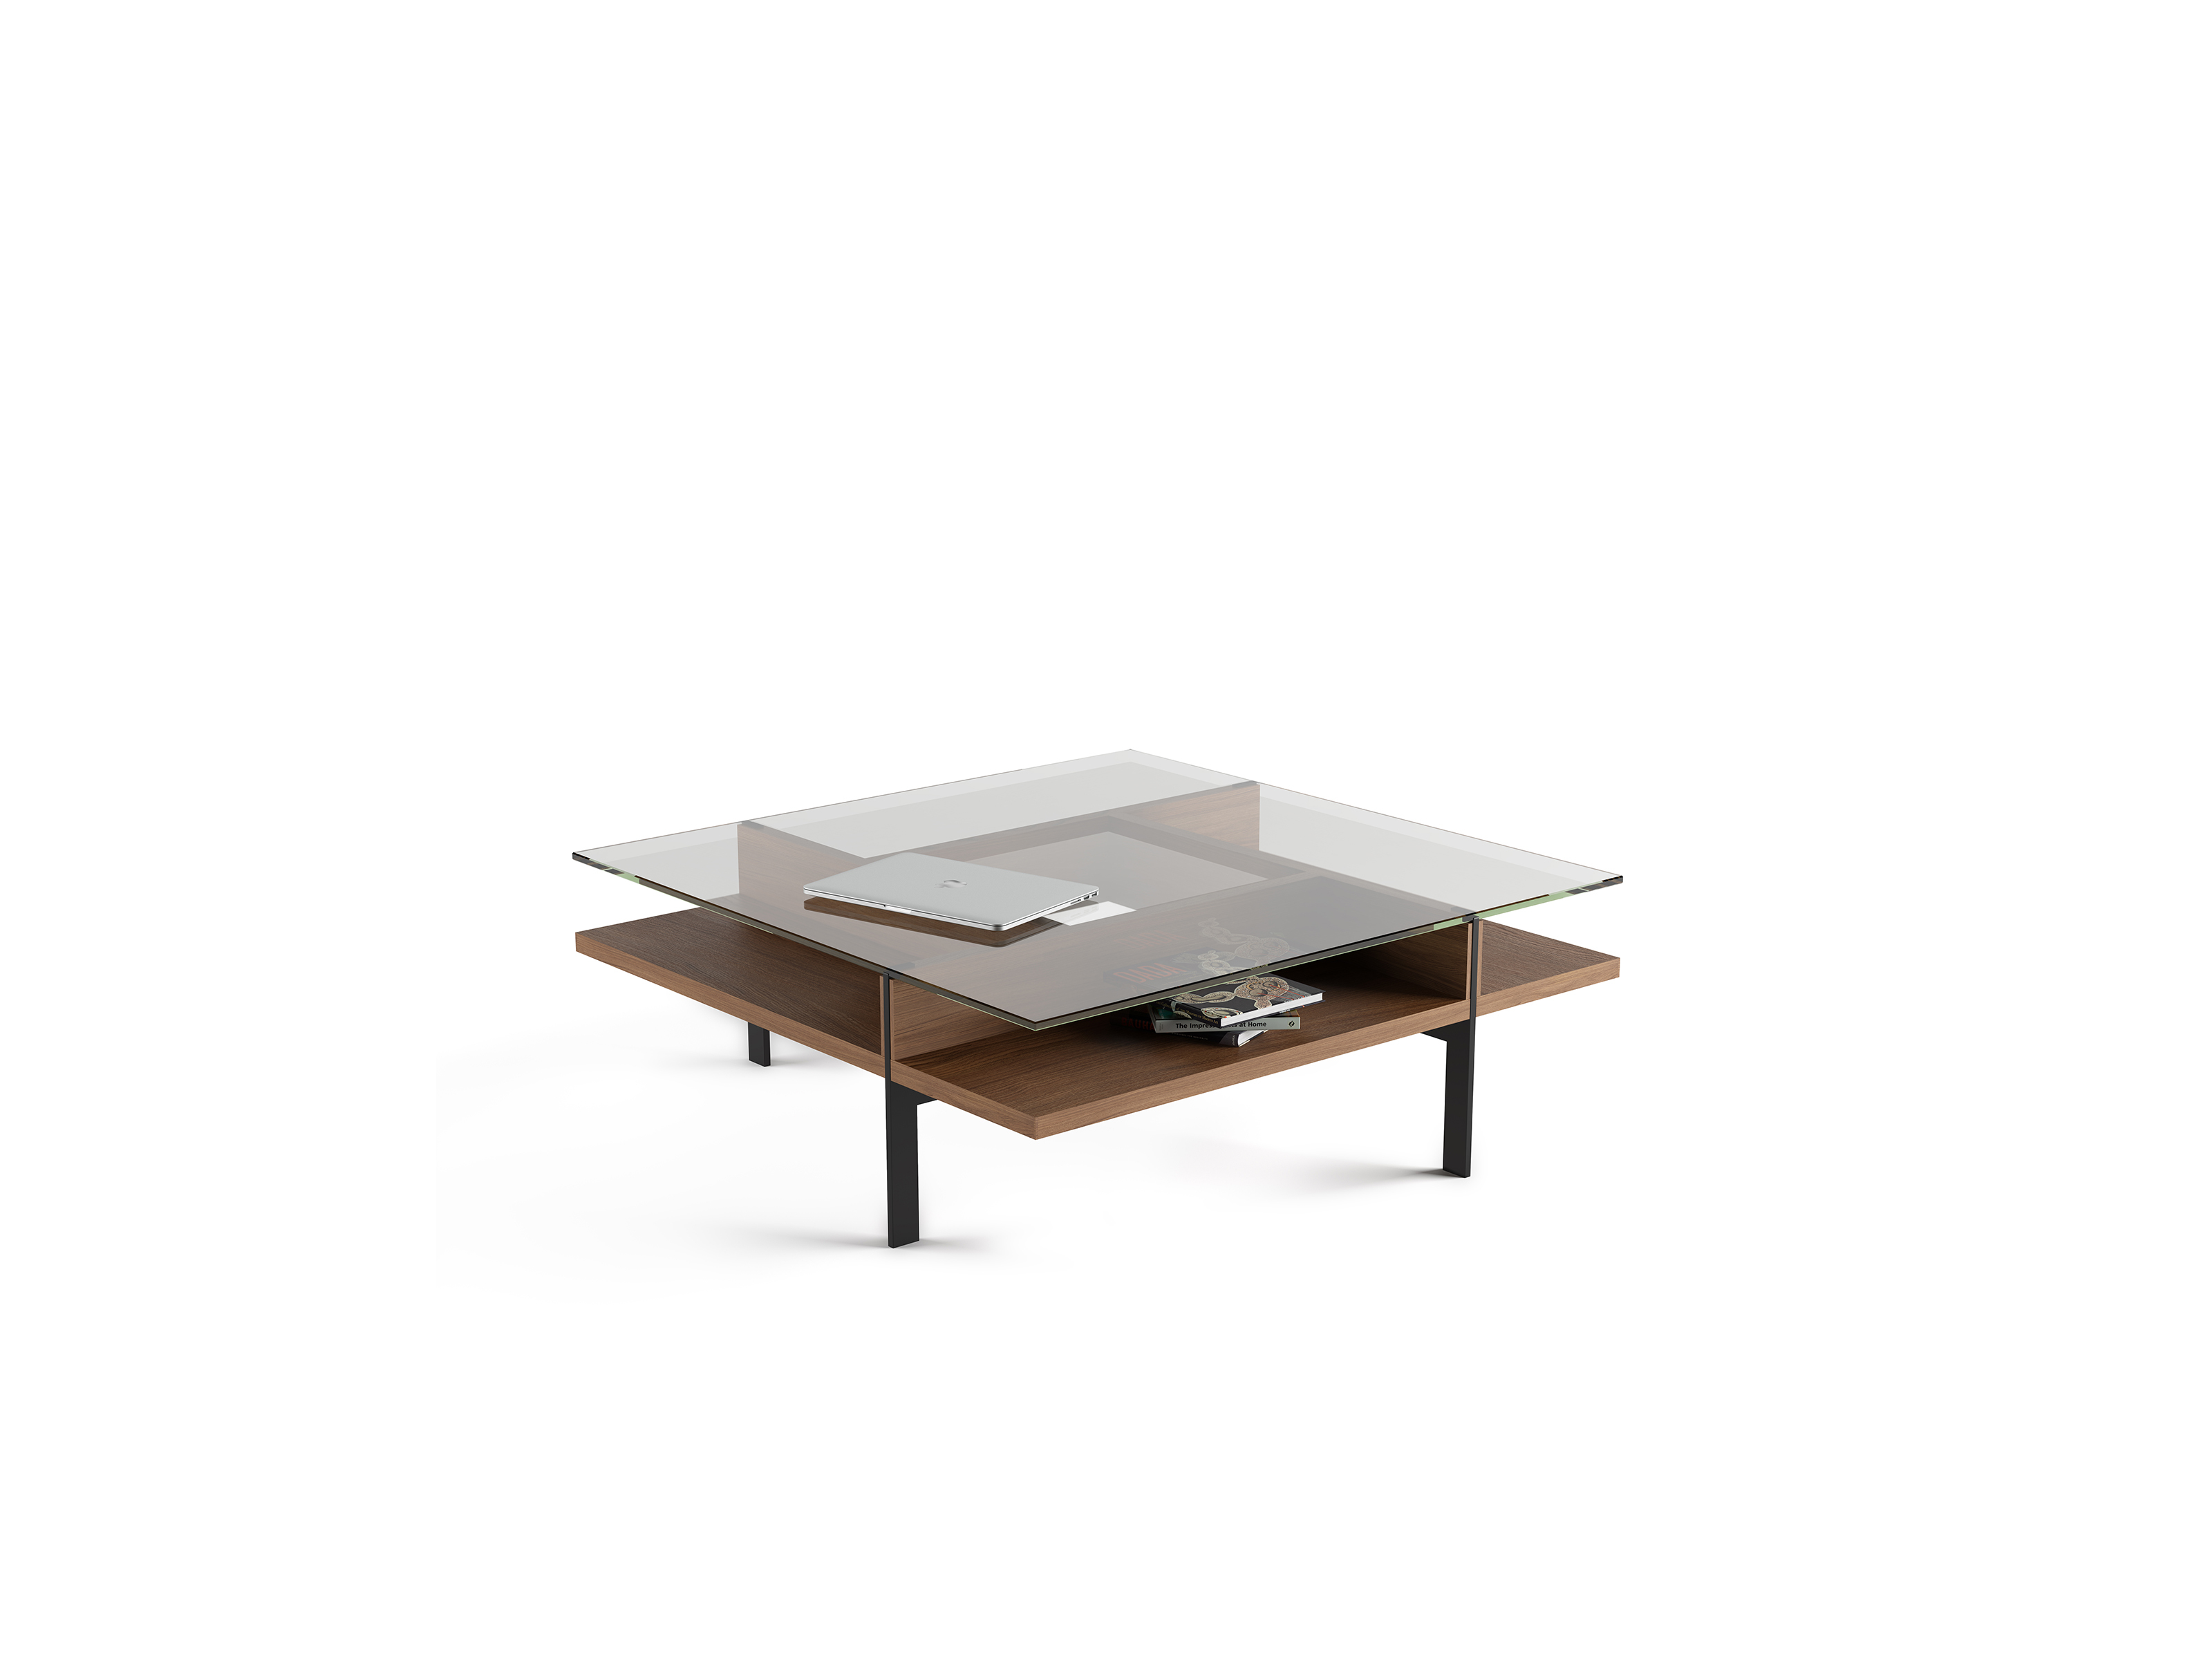 terrace 1150 modern square glass coffee